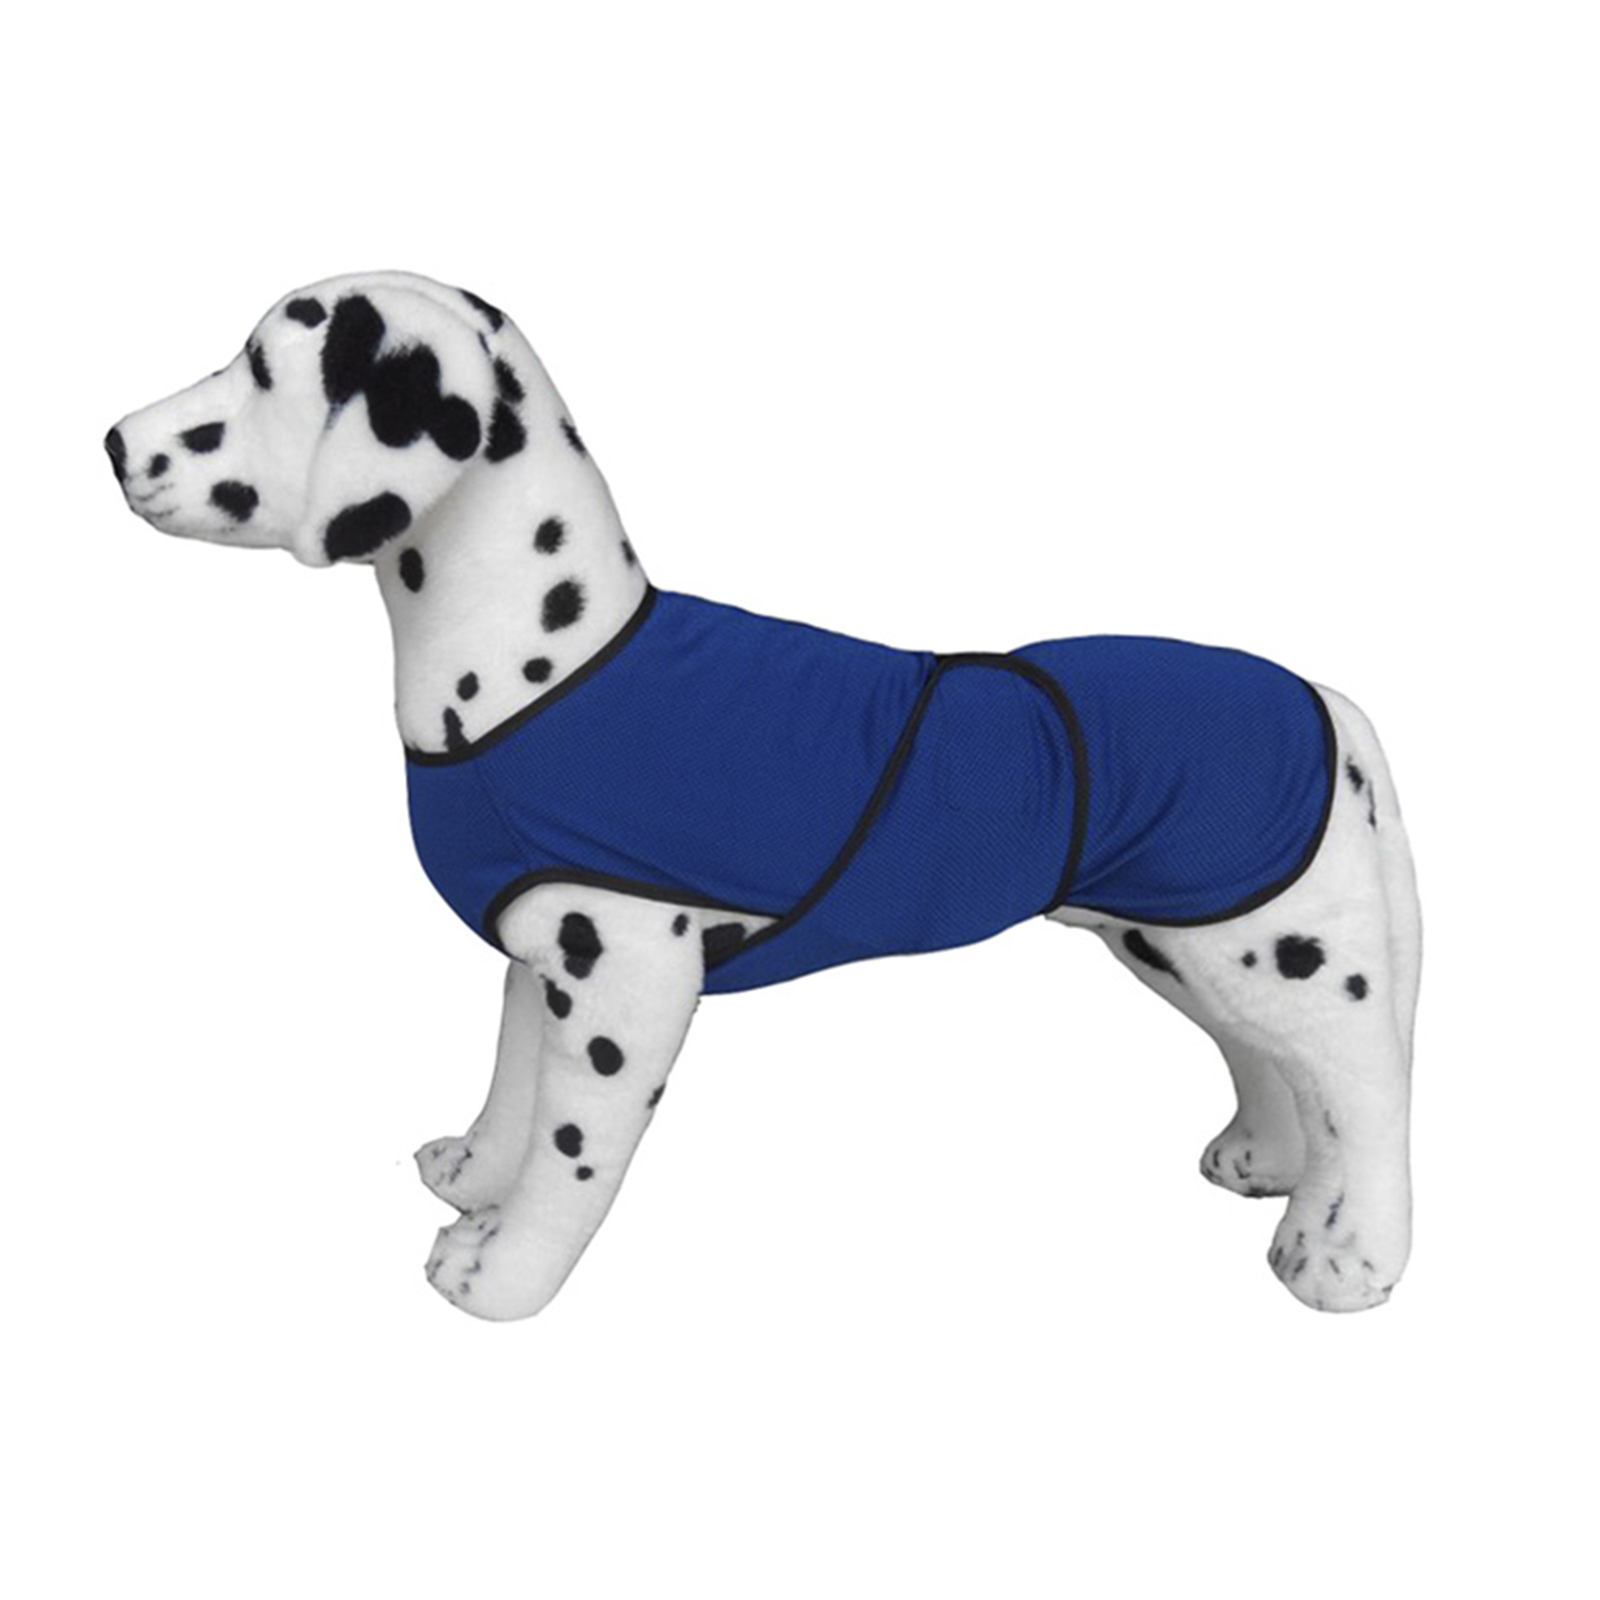 Chaqueta-Chaleco-de-Refrigeracion-Perro-Ropa-de-Verano-Chaleco-para-Mascotas miniatura 3